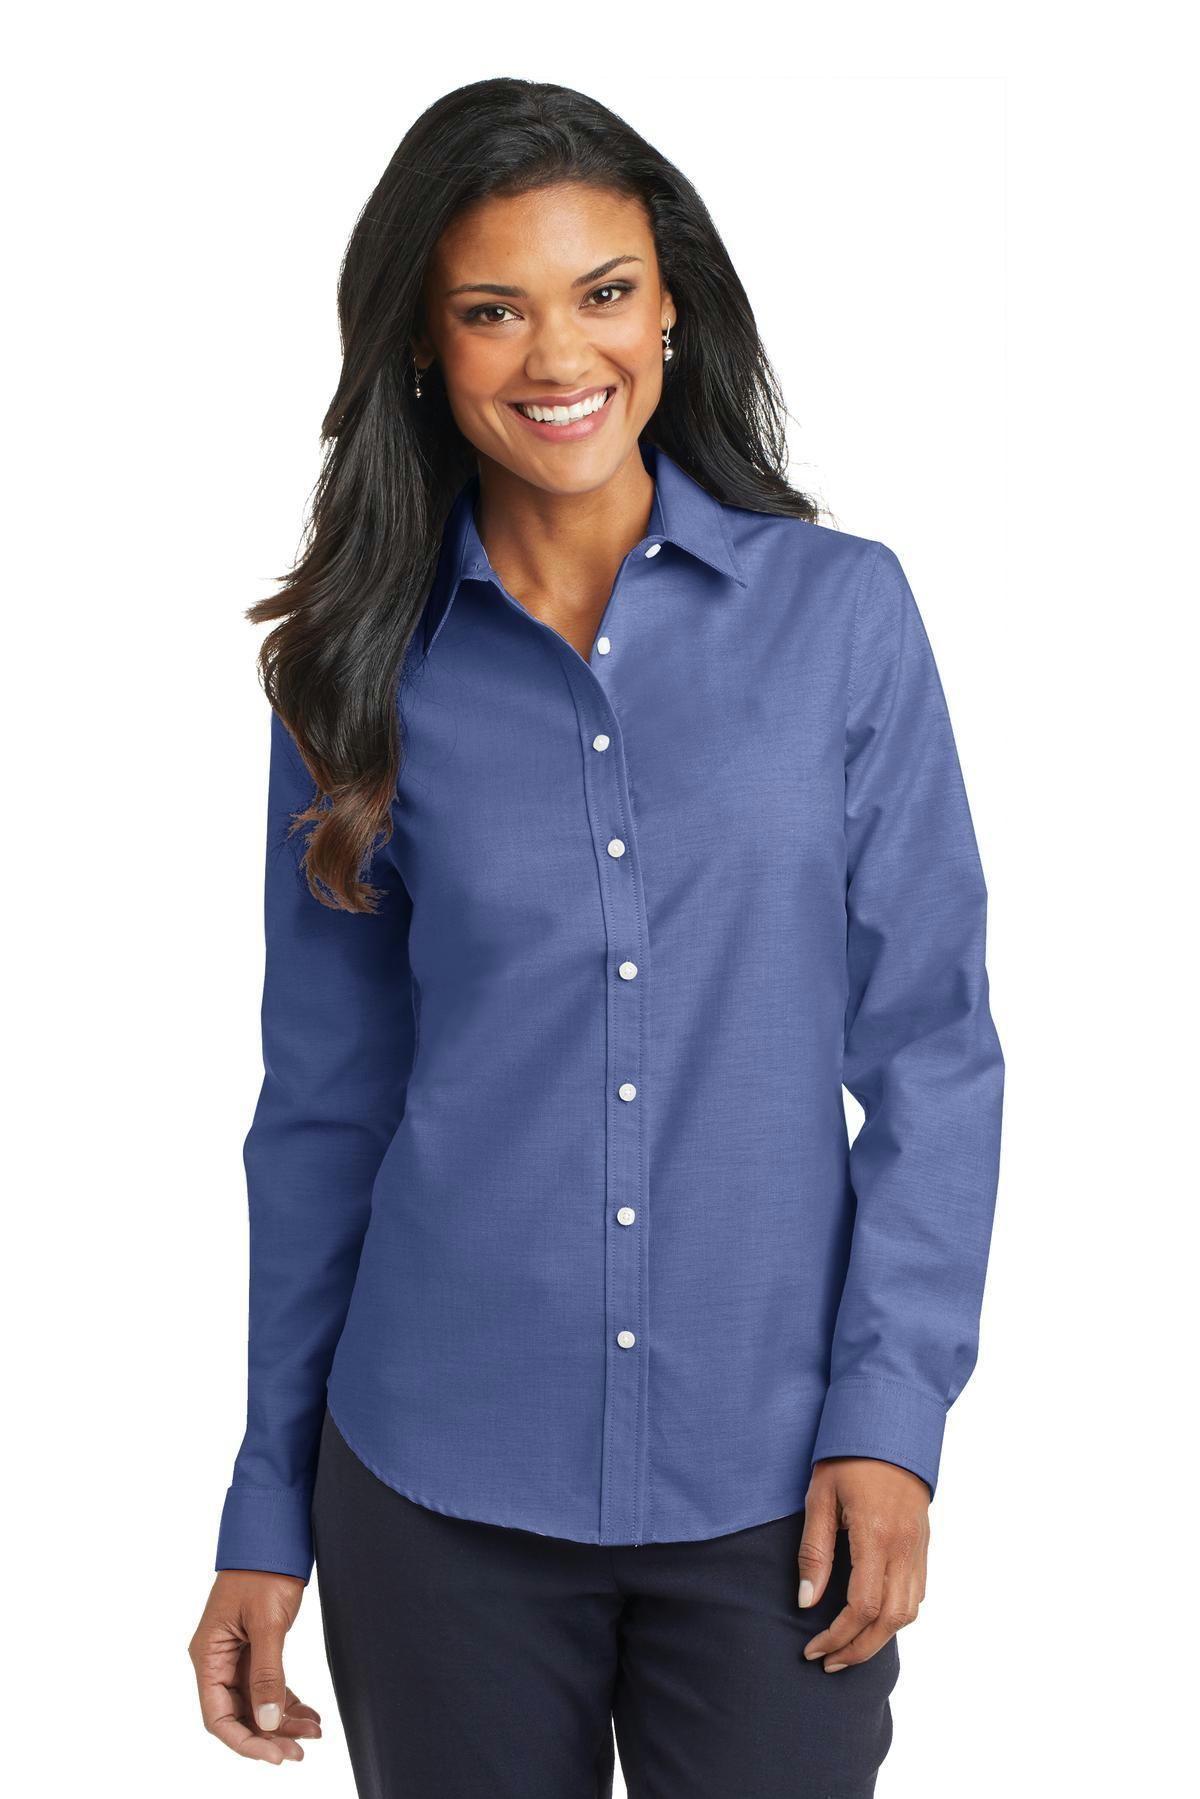 Superprooxford L658 Pinterest Port Ladies Shirt Products Authority 4q7Tv